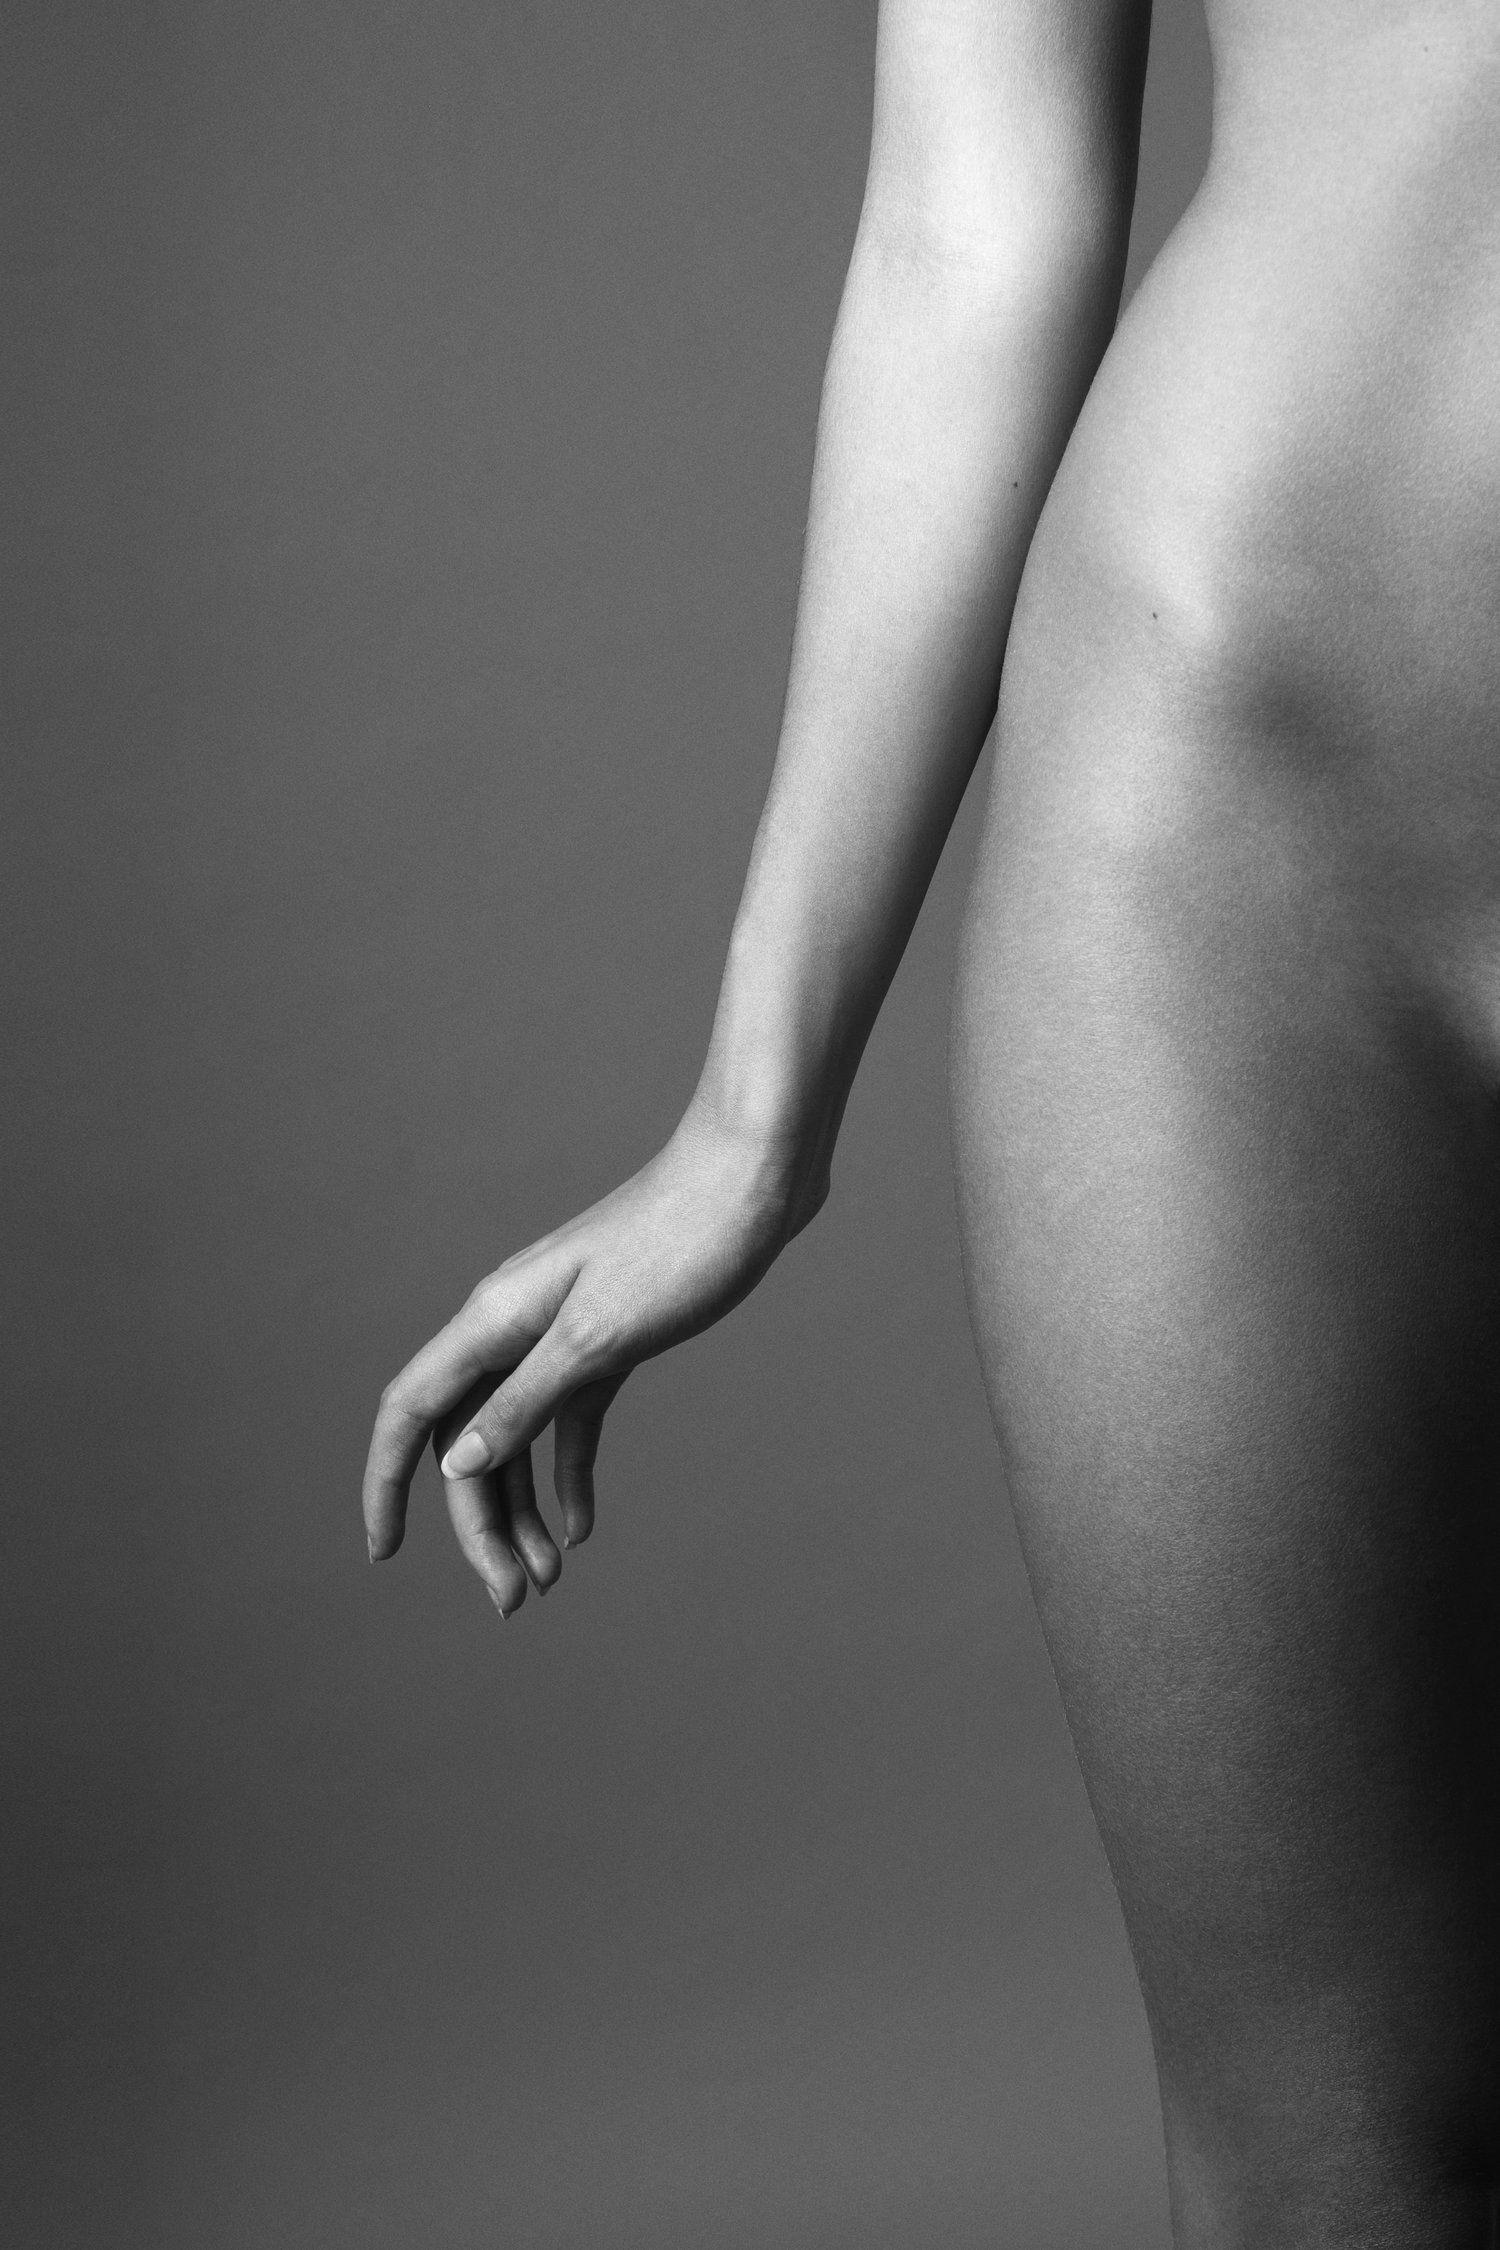 Snapchat Matilde Simone naked (94 photo), Topless, Paparazzi, Twitter, underwear 2020